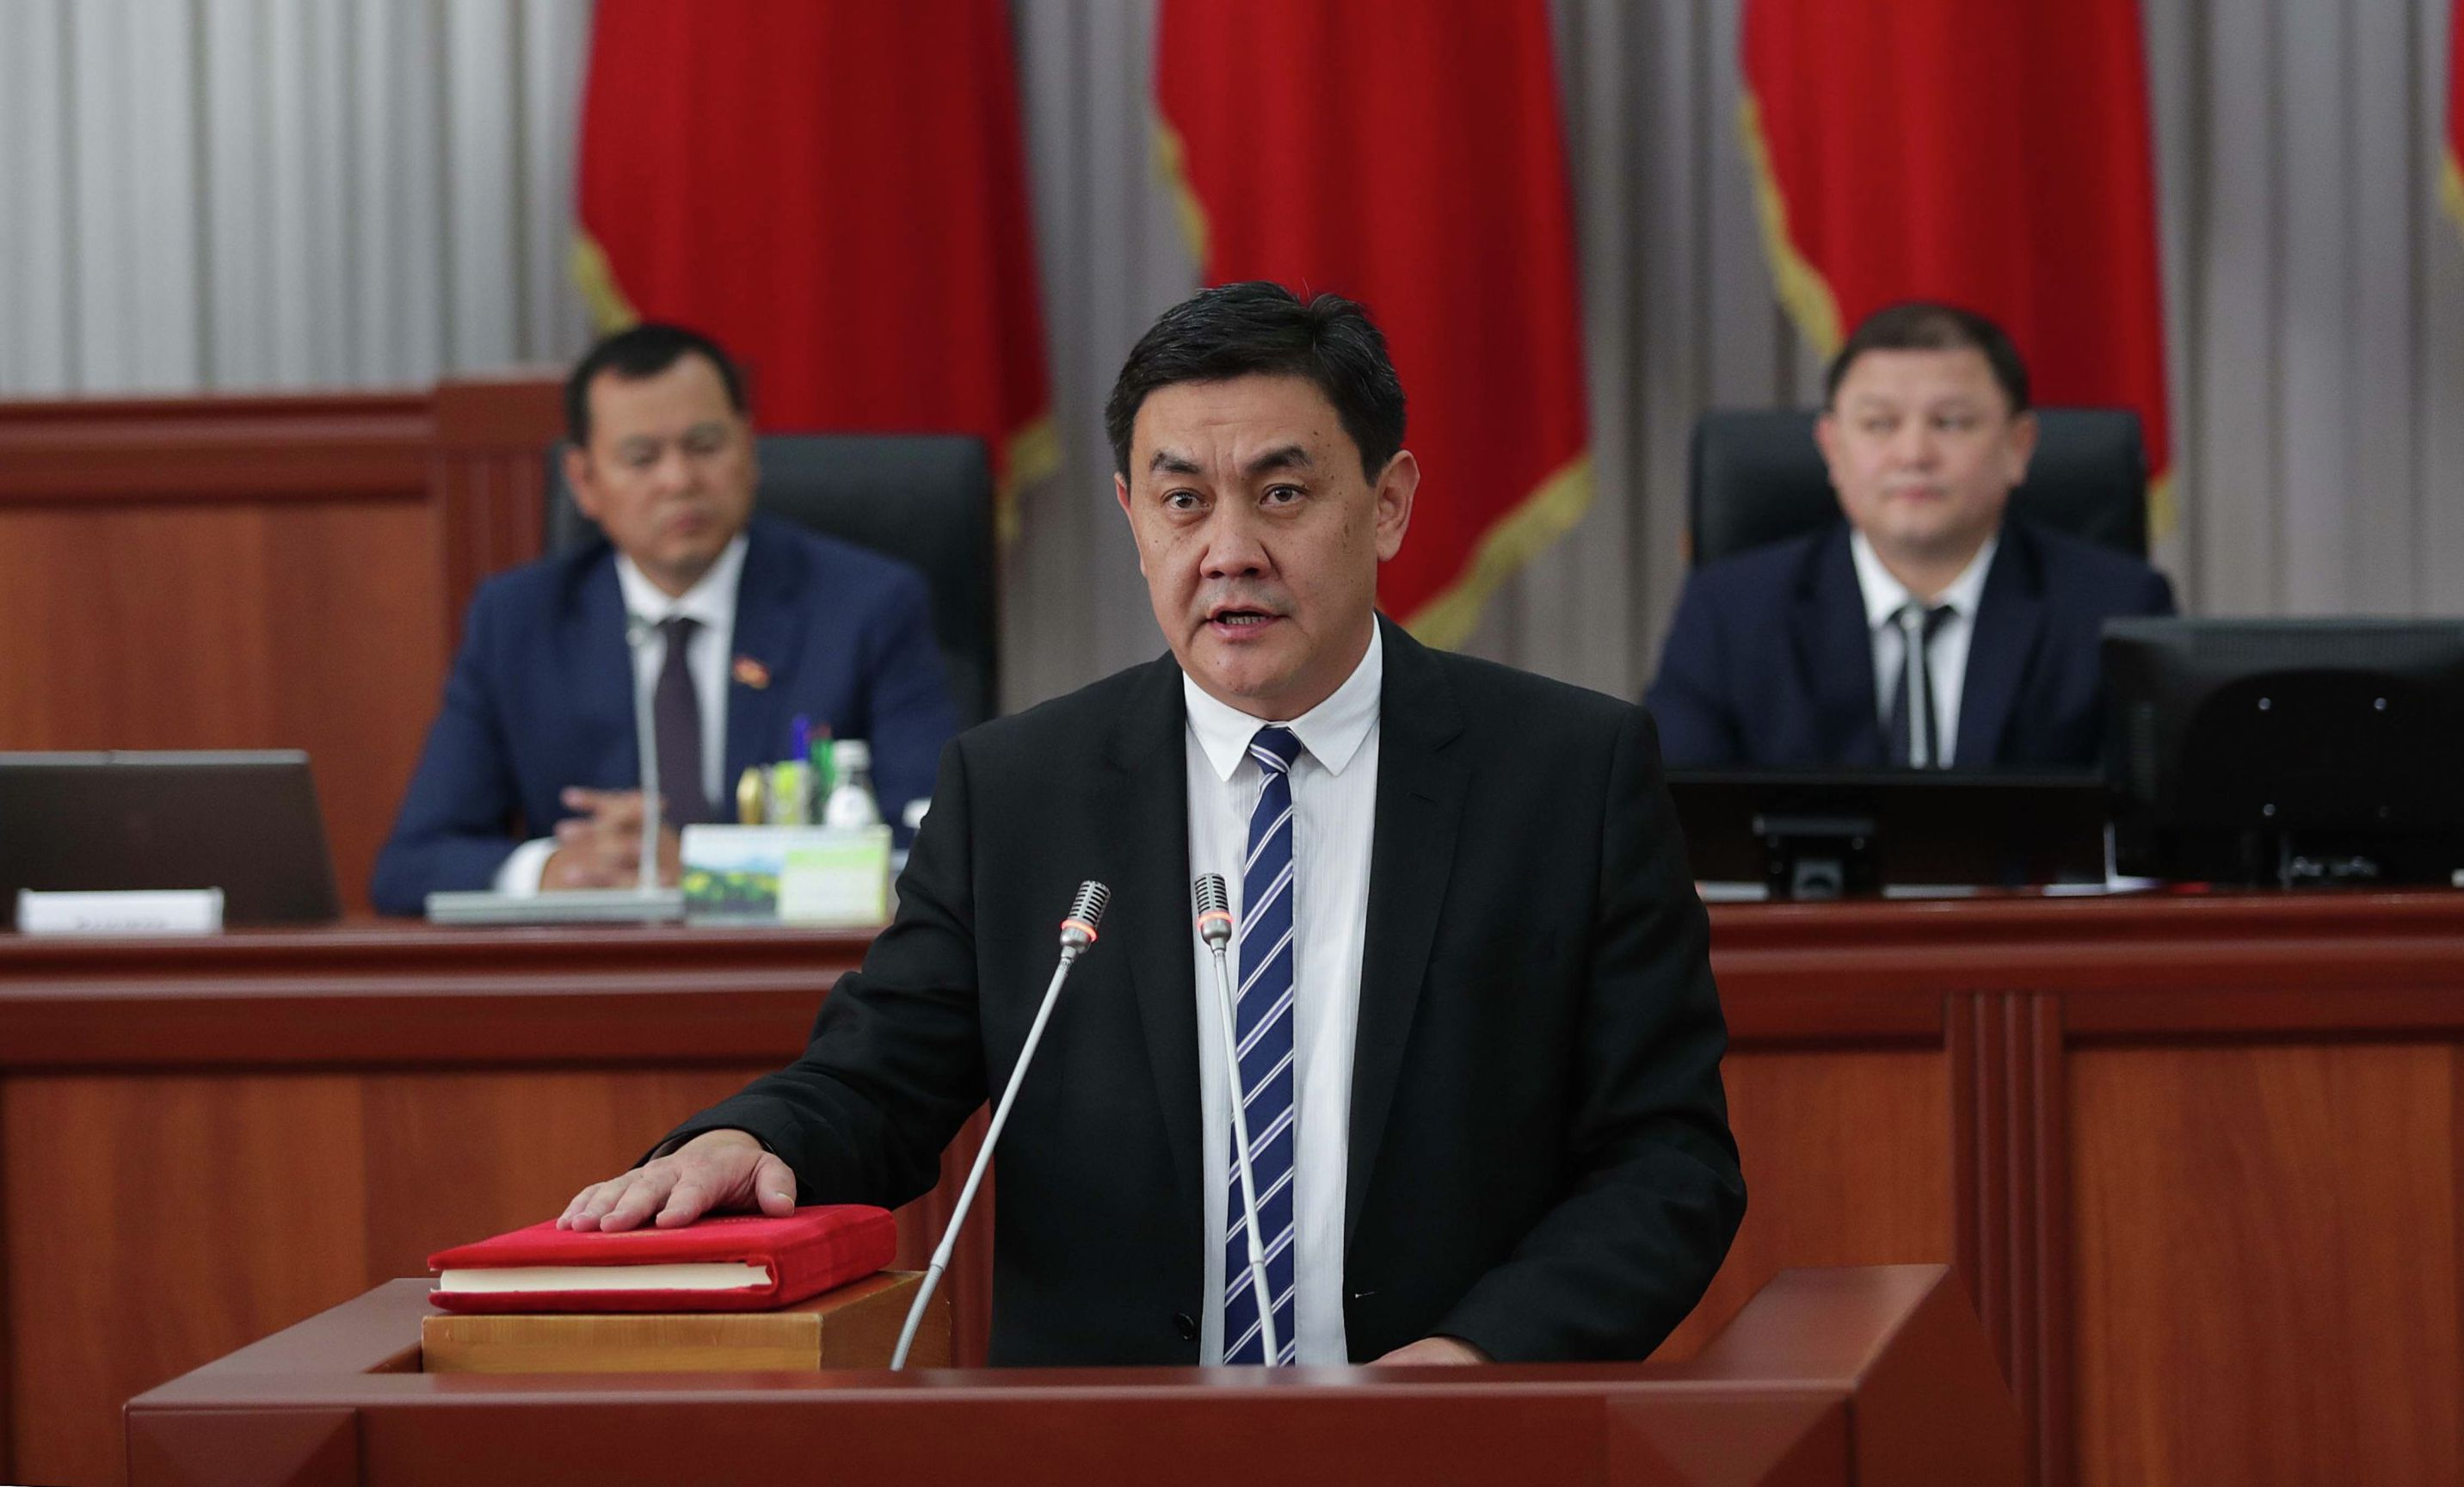 Министр экономики КР Санжар Муканбетов во время дачи присяги в Жогорку Кенеше